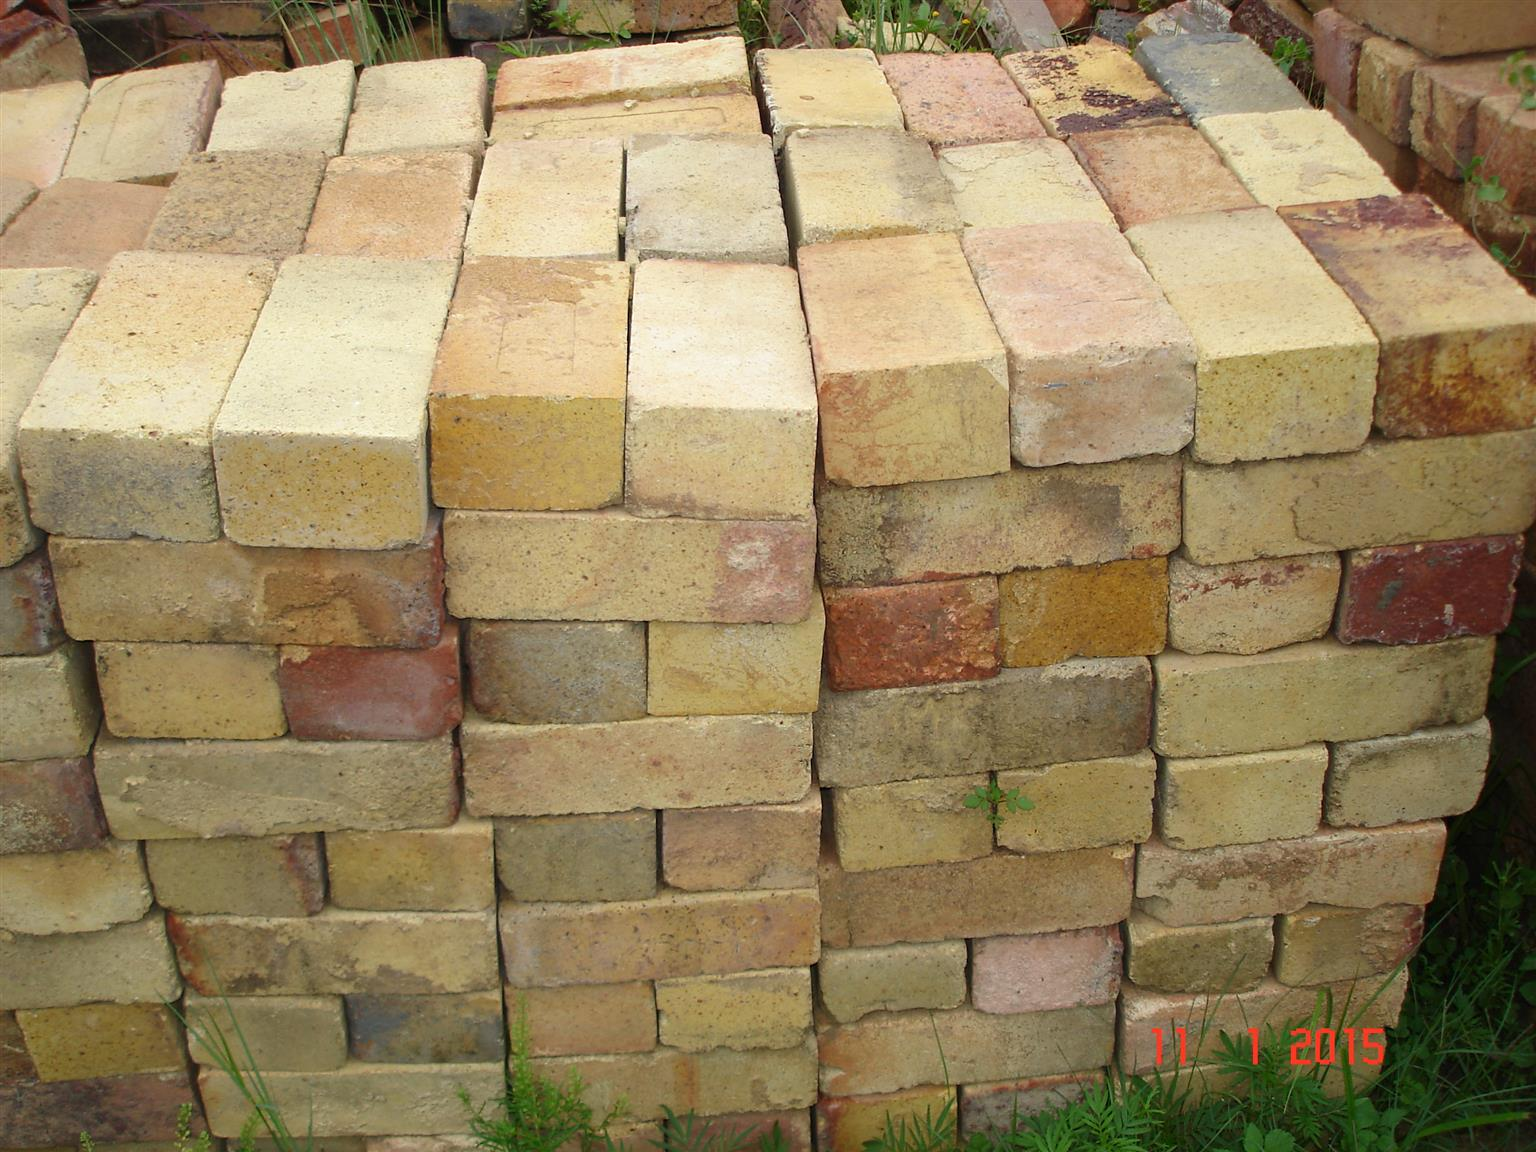 Bricks For Sale >> Refactory Fire Bricks For Sale